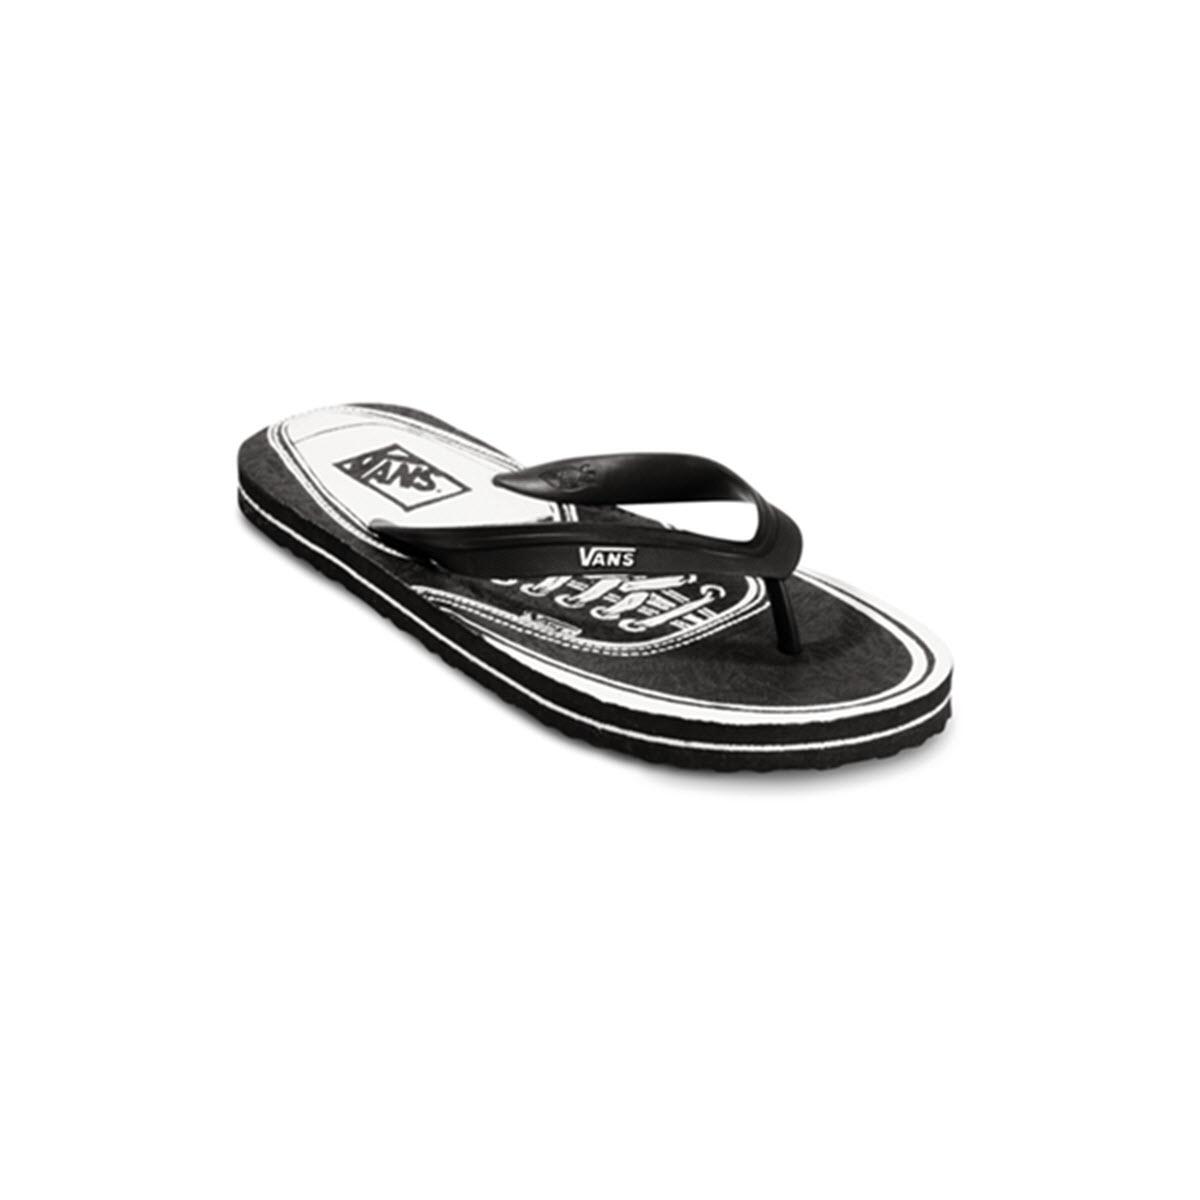 8b92565648e Vans-Lanai-Mens-Flip-Flops-Sandals thumbnail 4